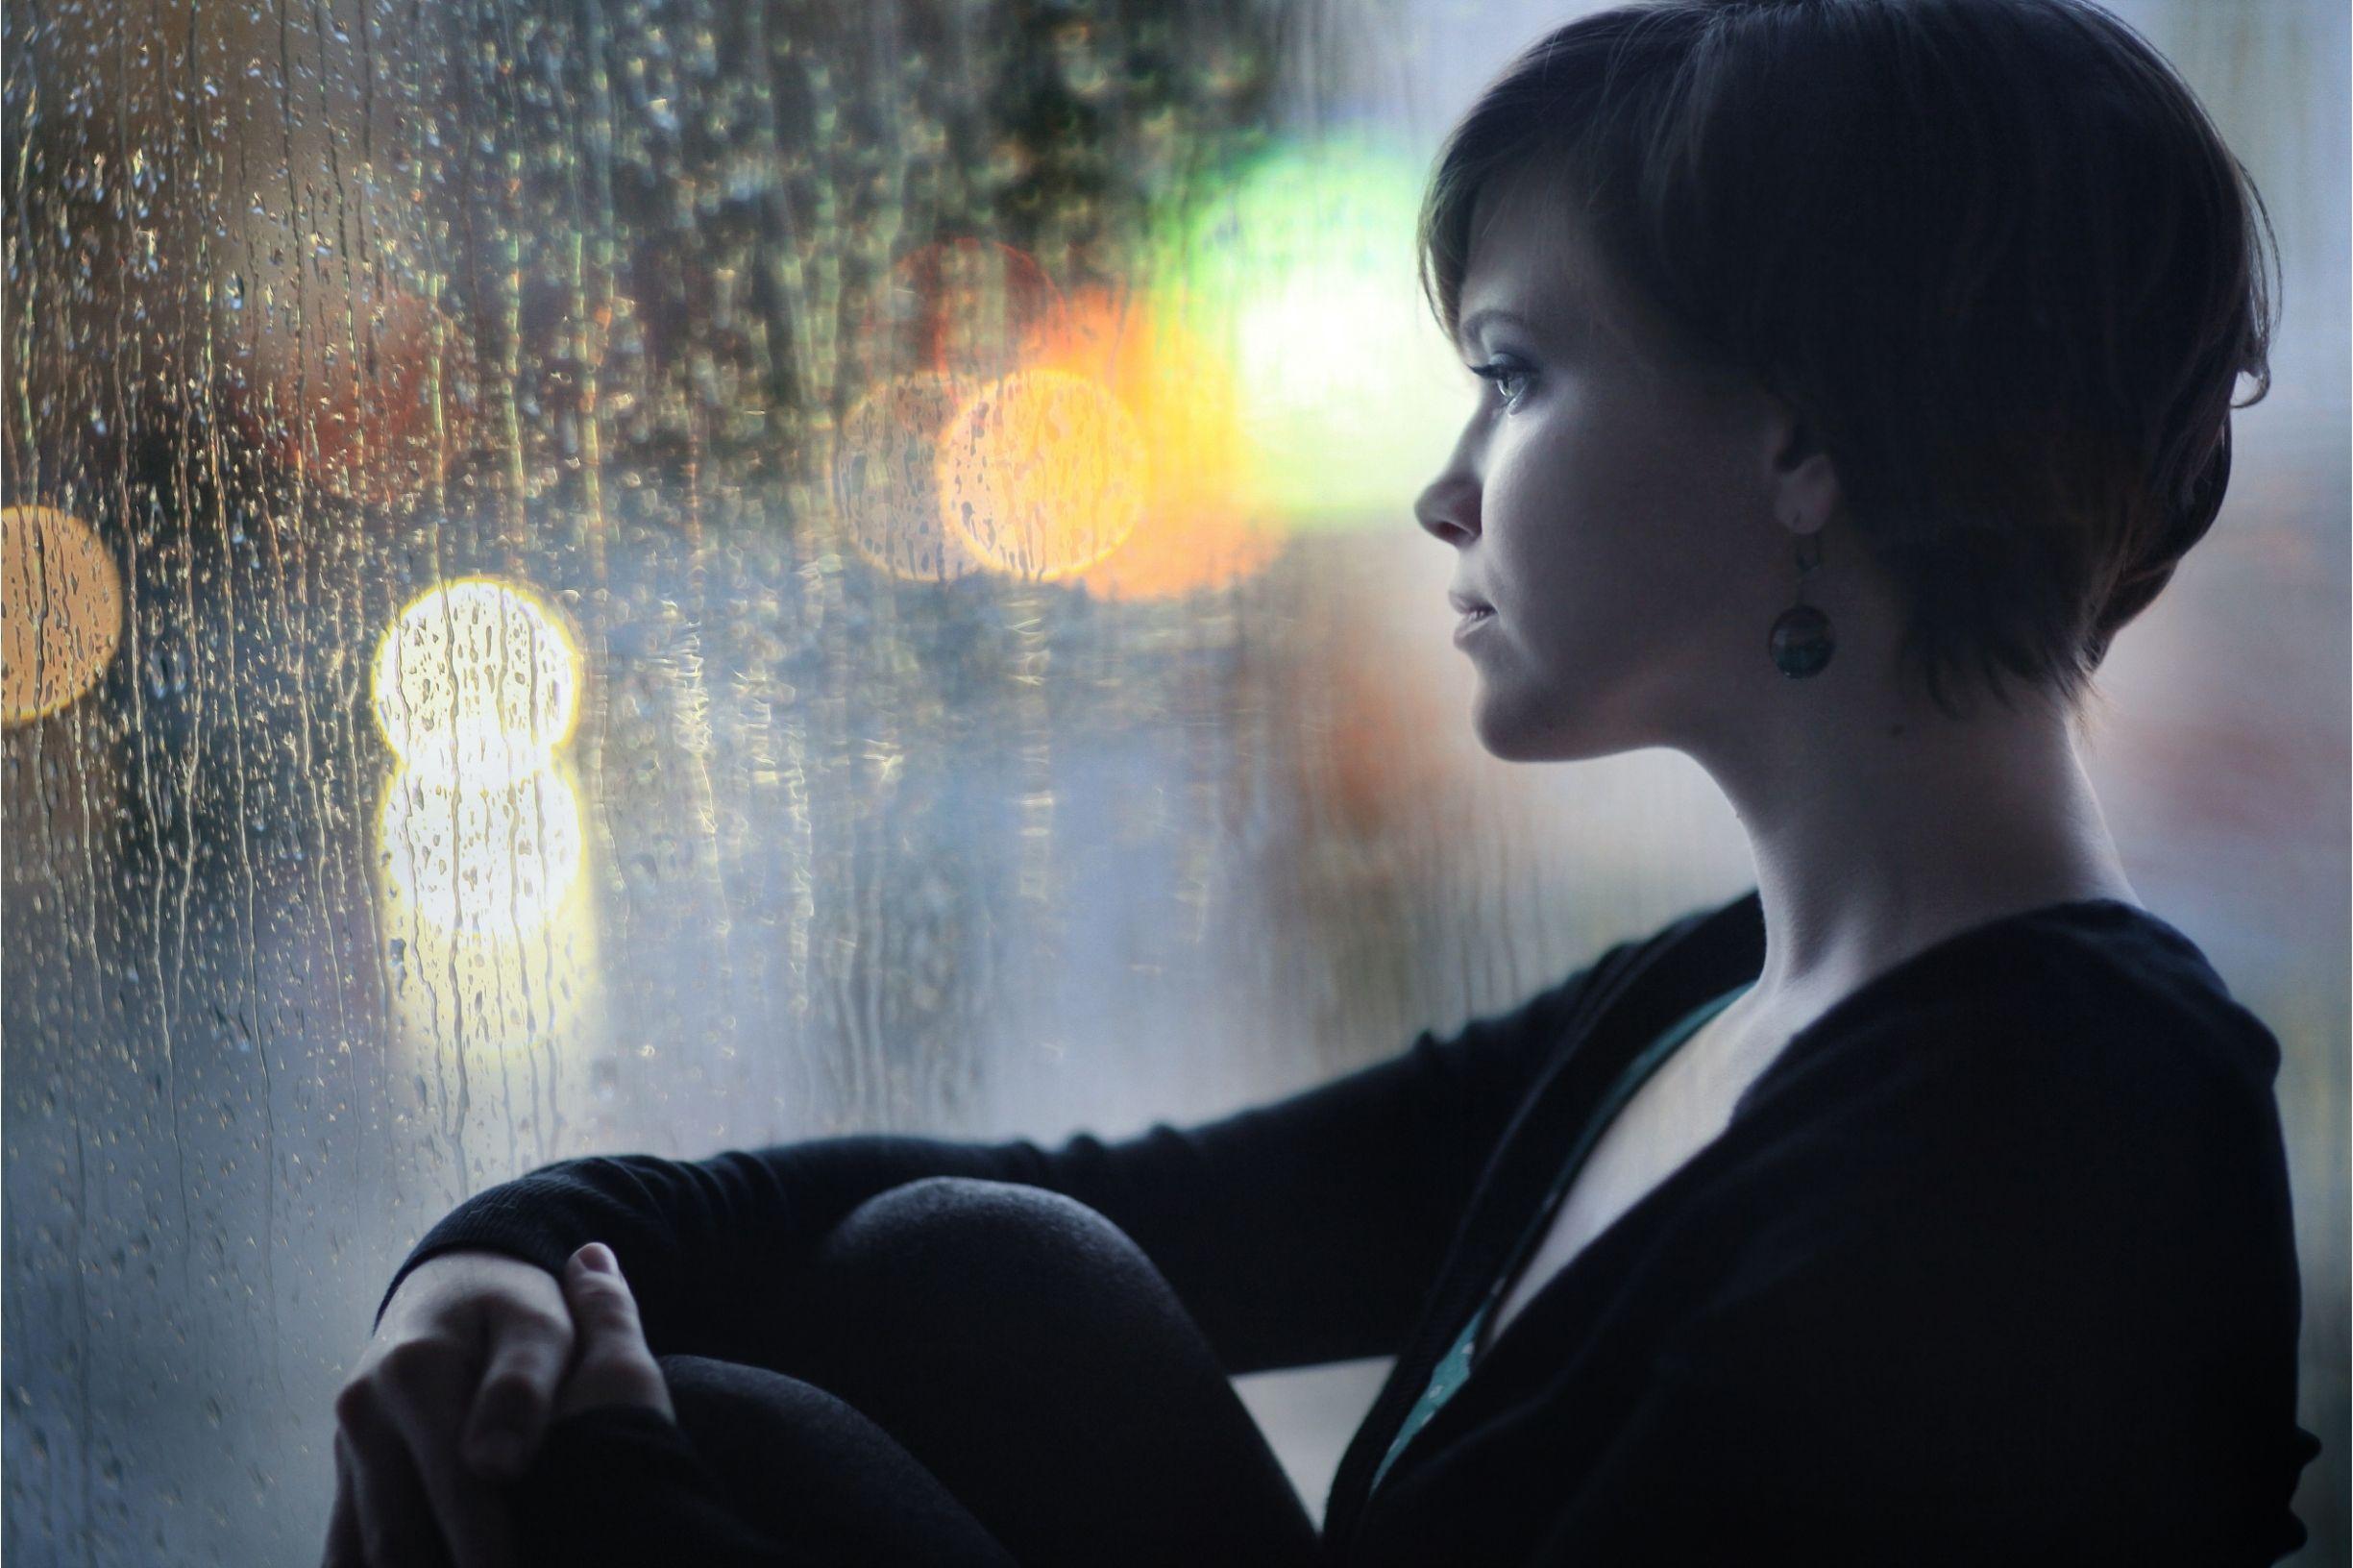 woman contemplating staring rain through window